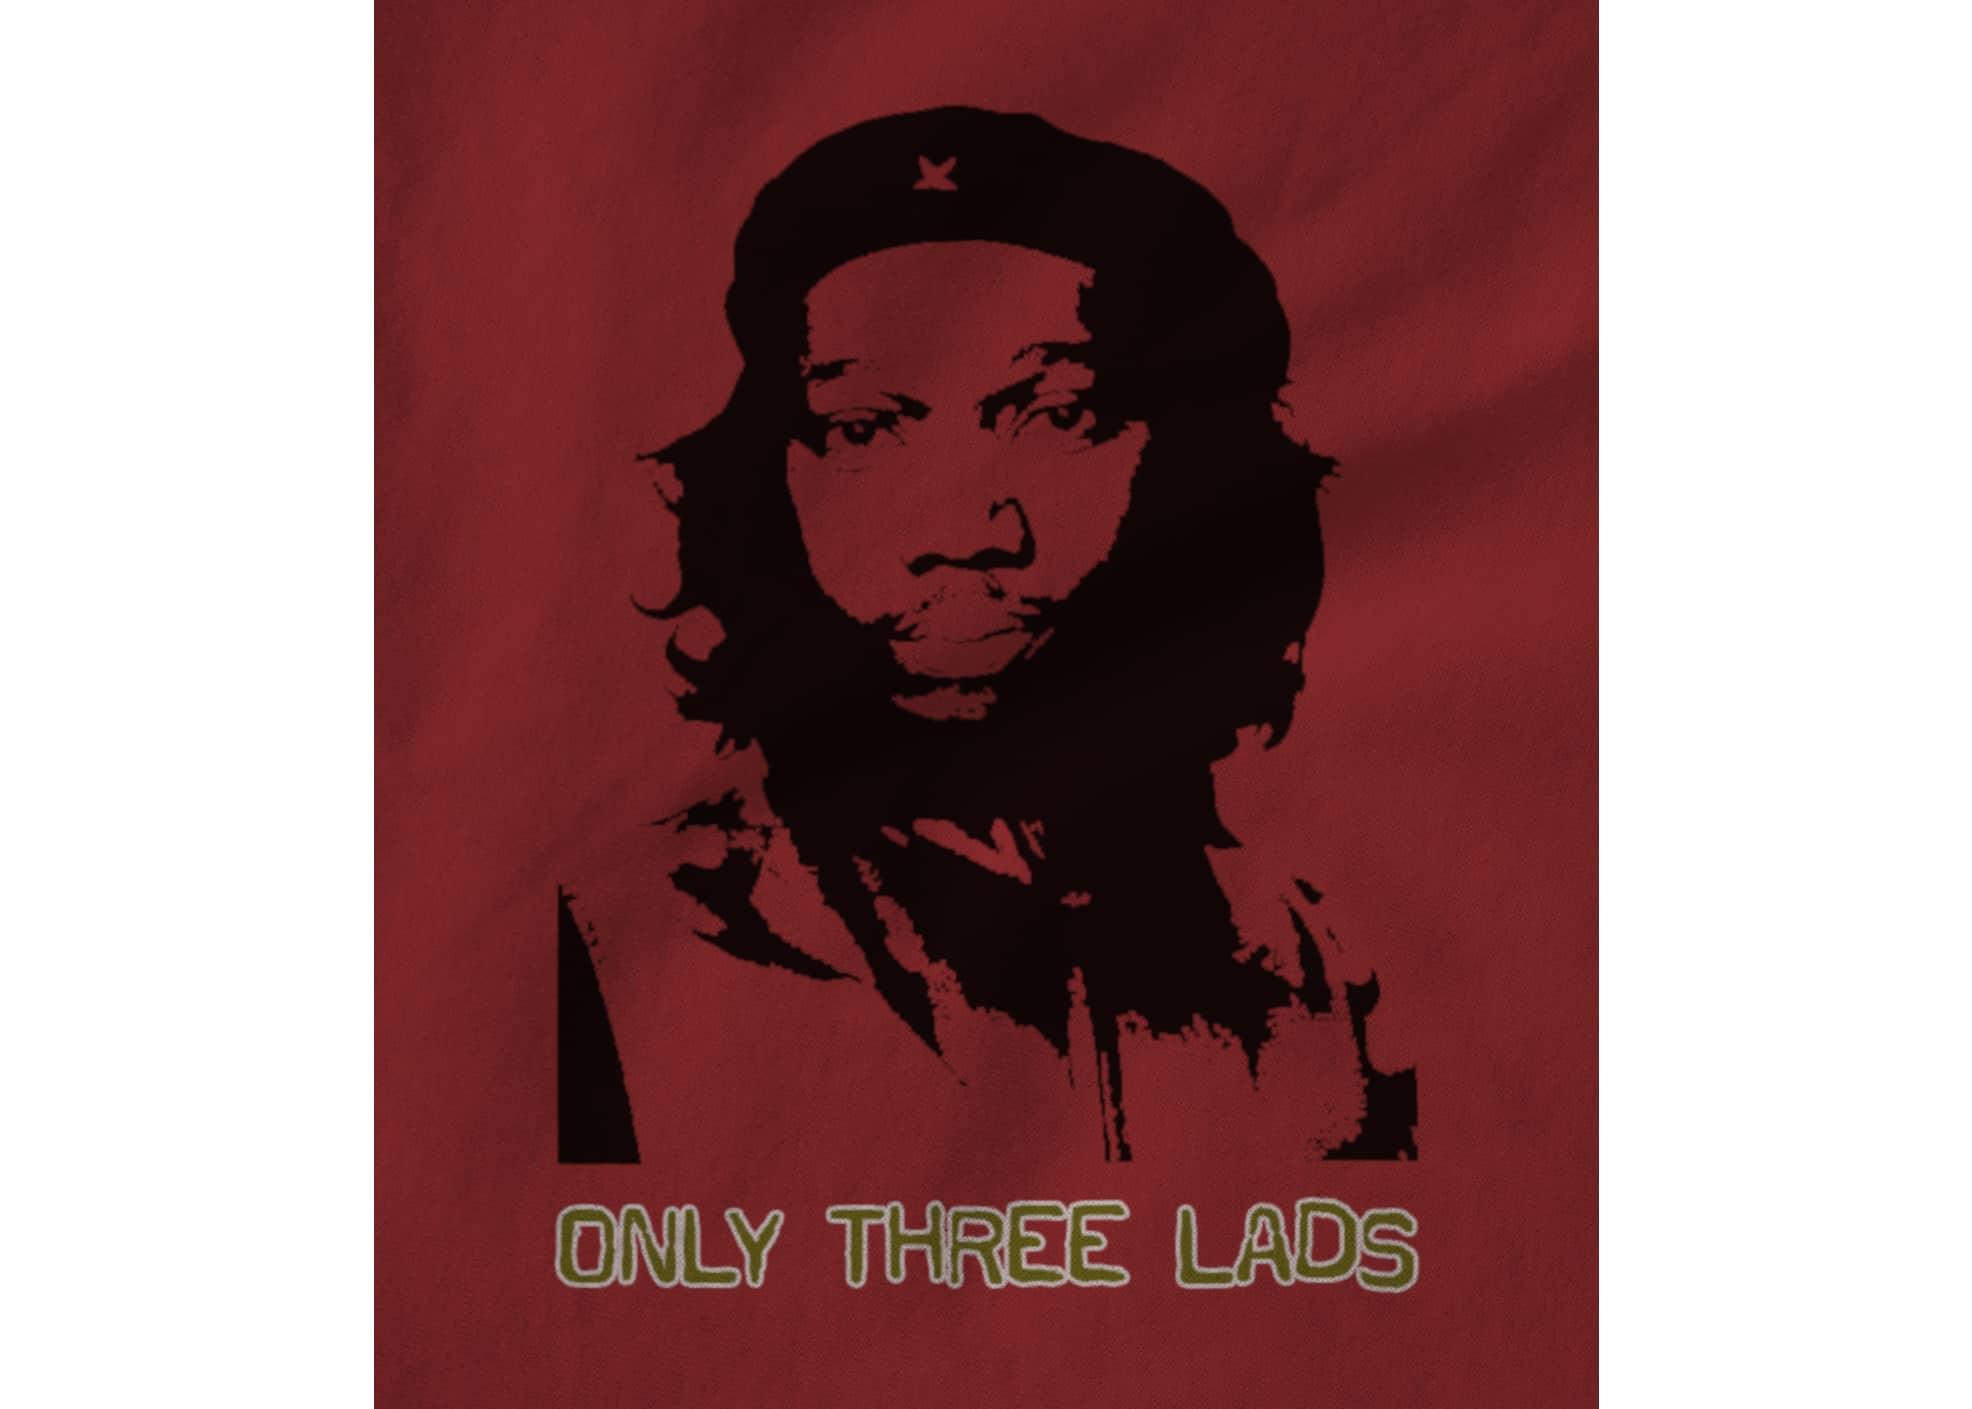 Only three lads revolution 2 1629780256